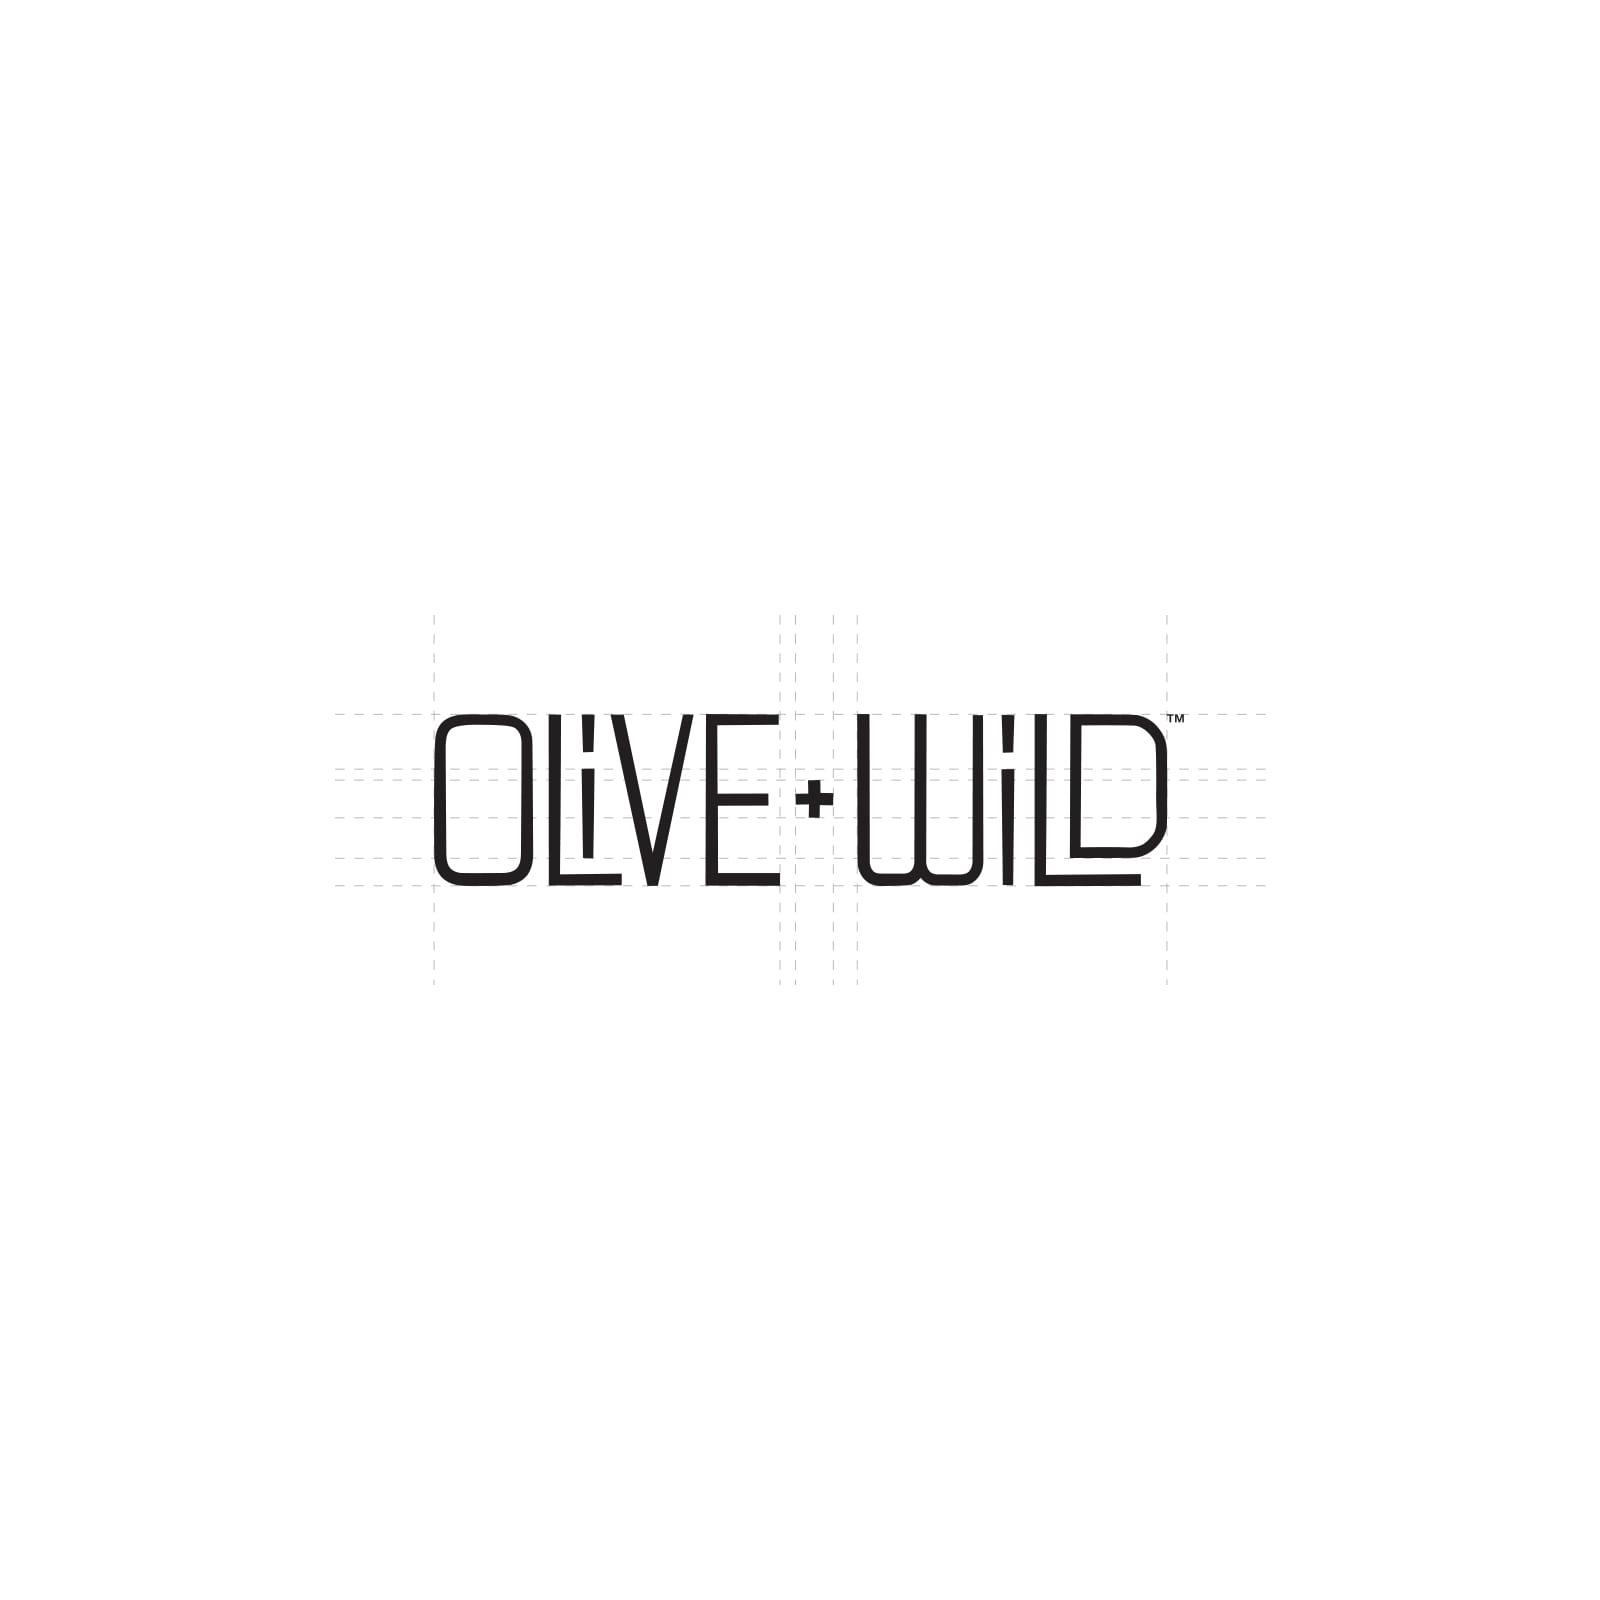 Y5 Creative Case Studies Olive Wild Work Process 1